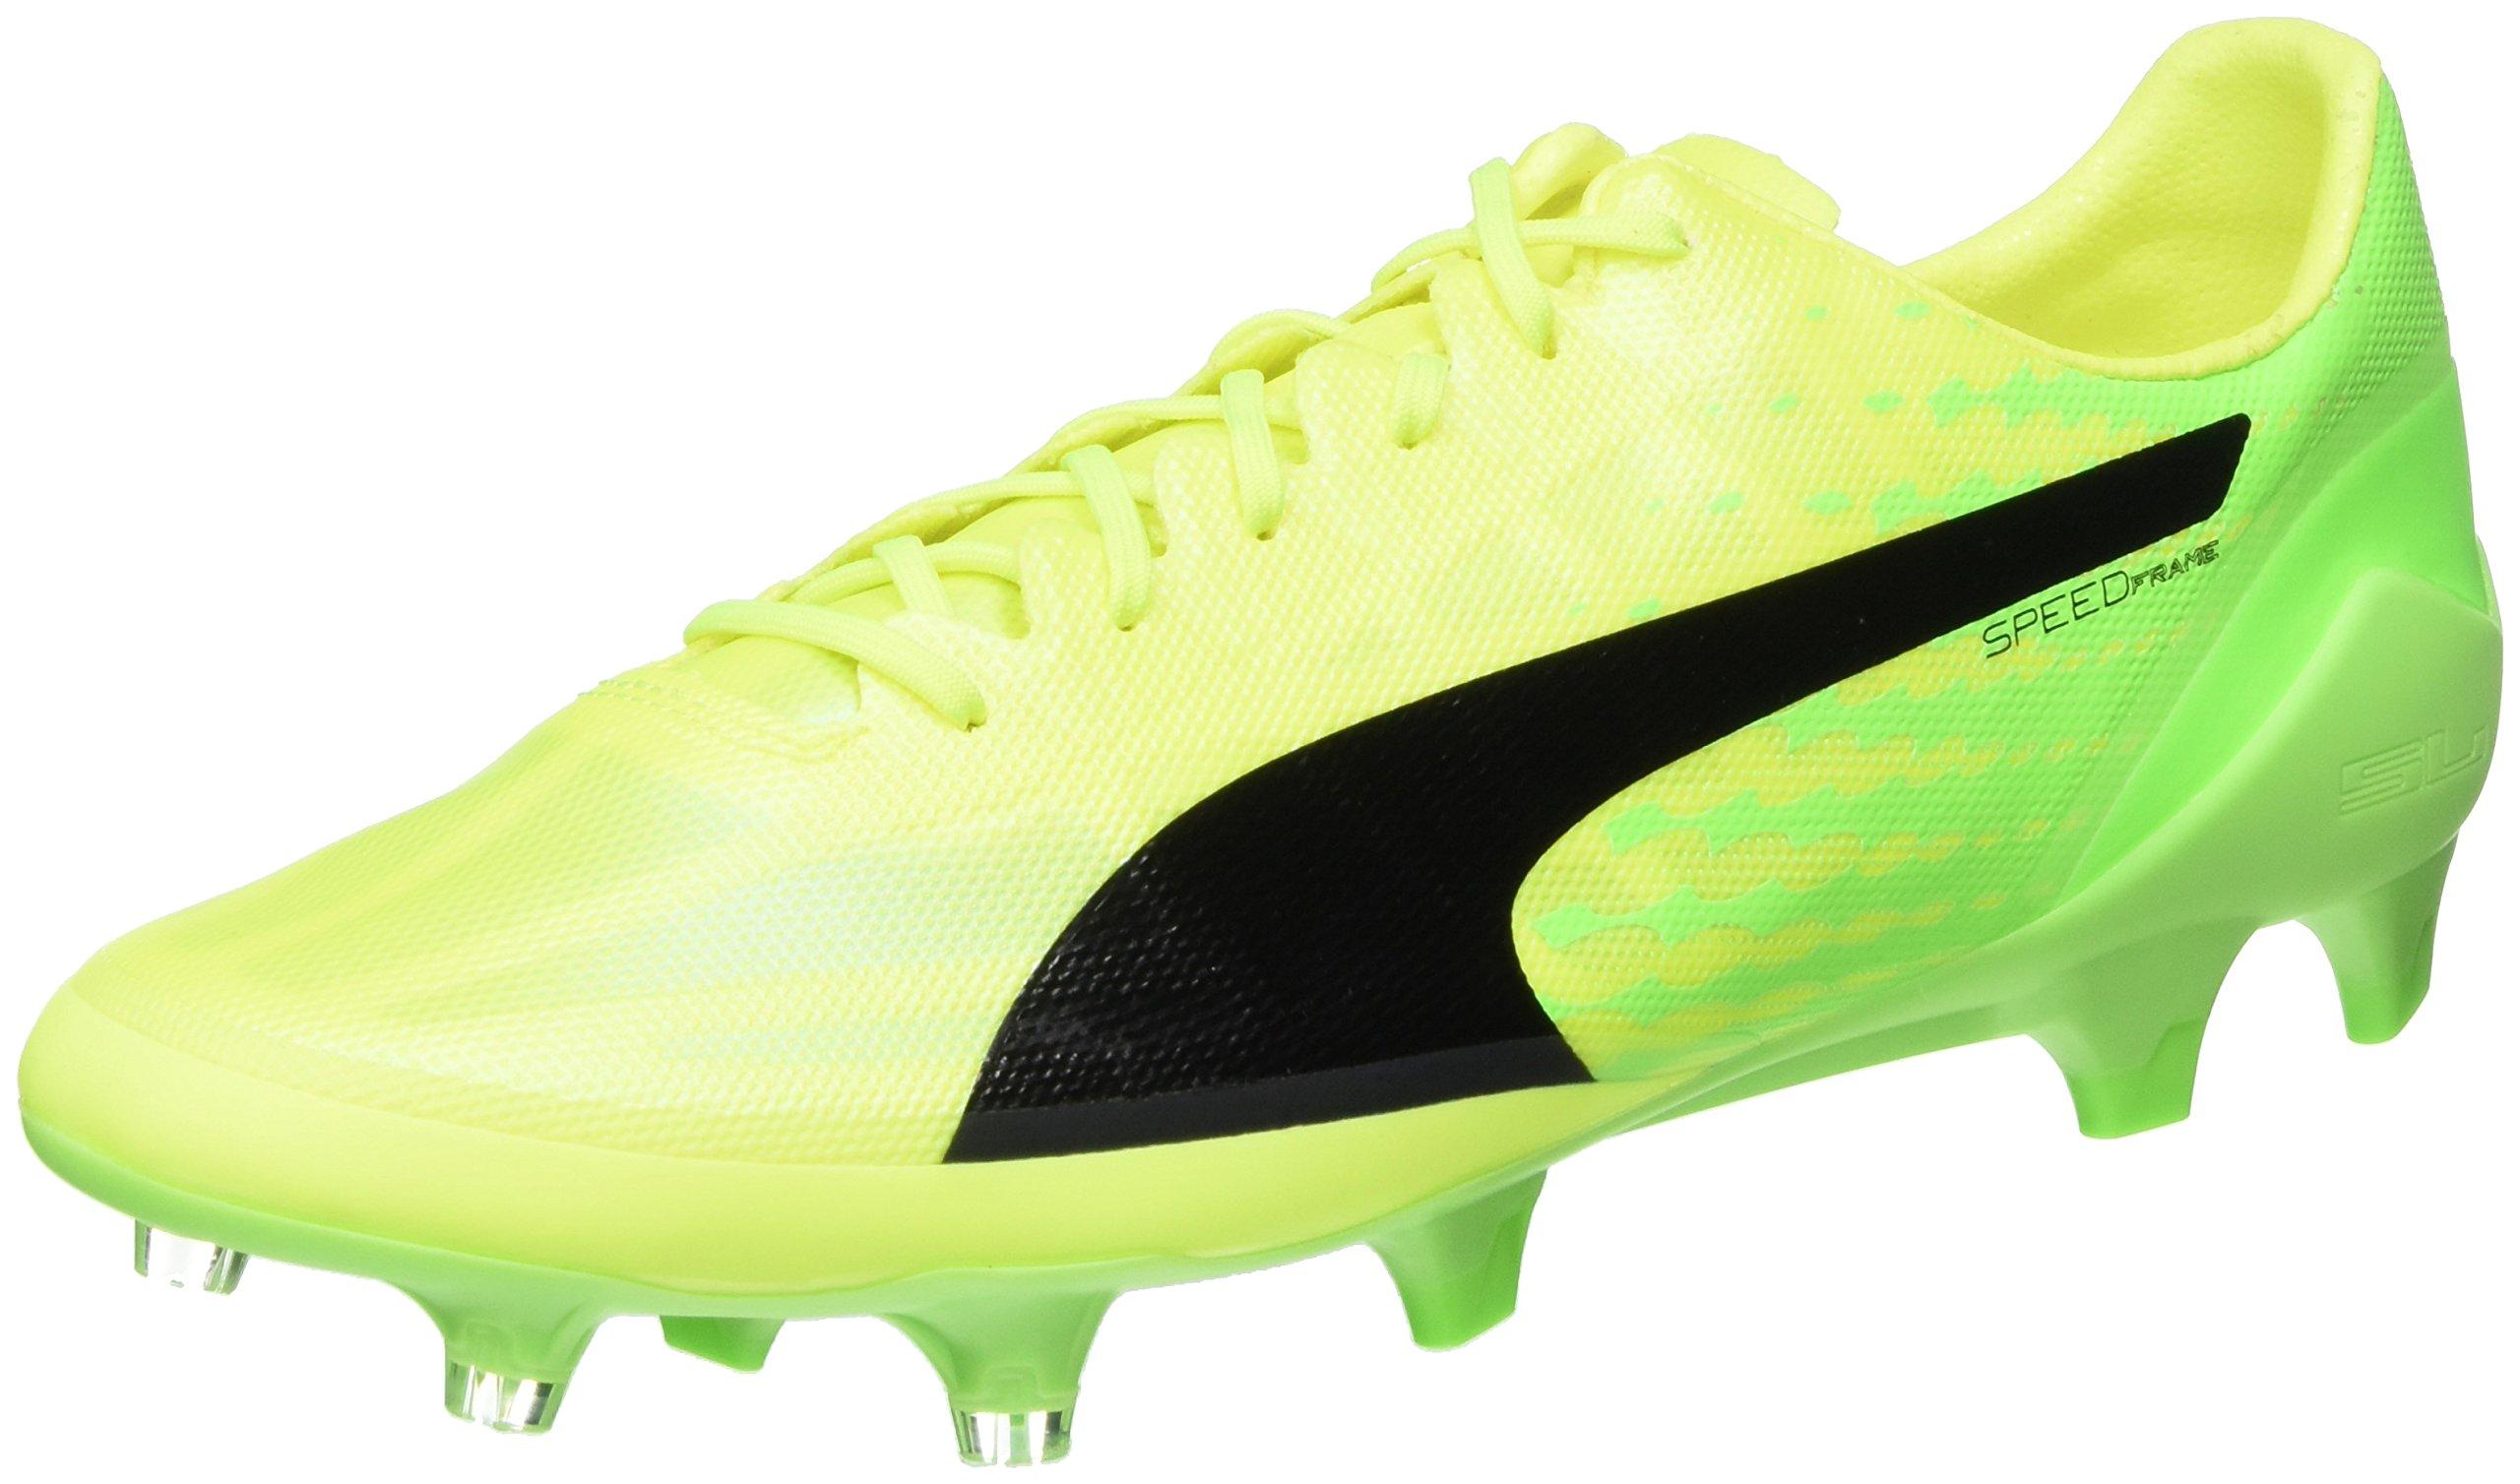 Gecko Yellow Puma FgChaussures Sl Evospeed Eu 0145 De HommeJaunesafety Black 17 green Football ybf67vYg